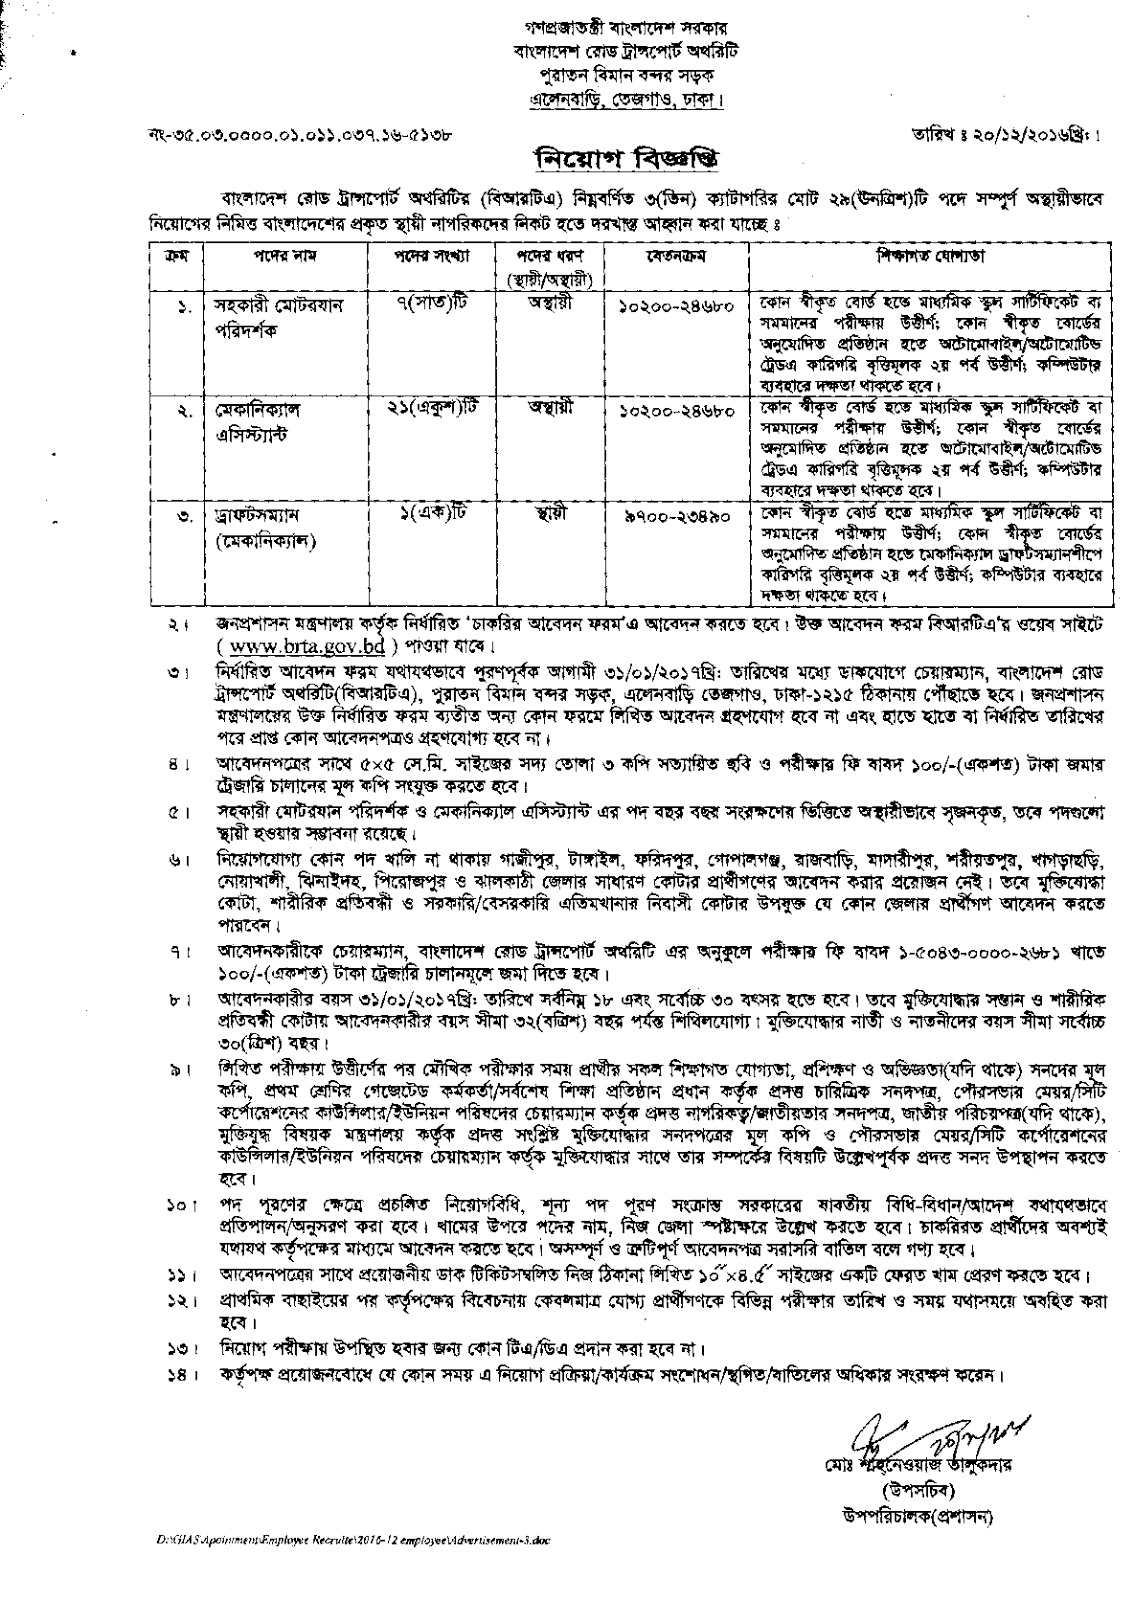 Student Information: Bangladesh Road Transport Authority